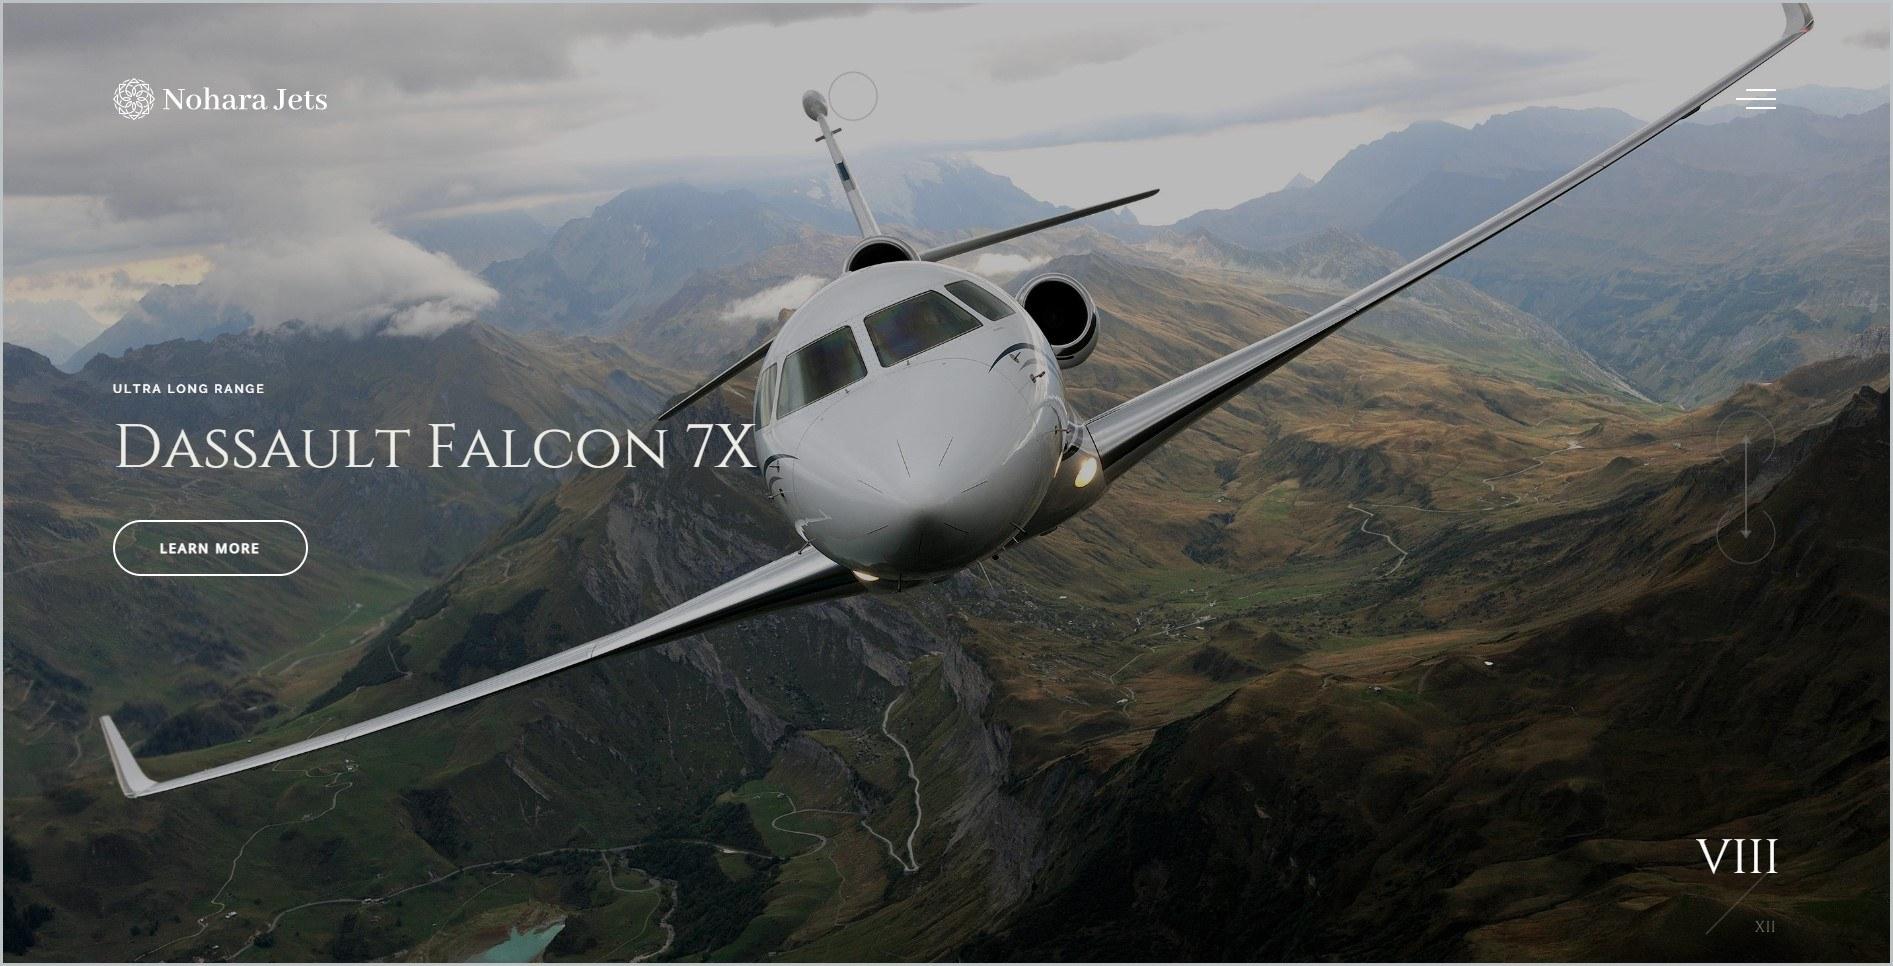 screenshot of Nohara Jets homepage, showcasing an aircraft in midflight